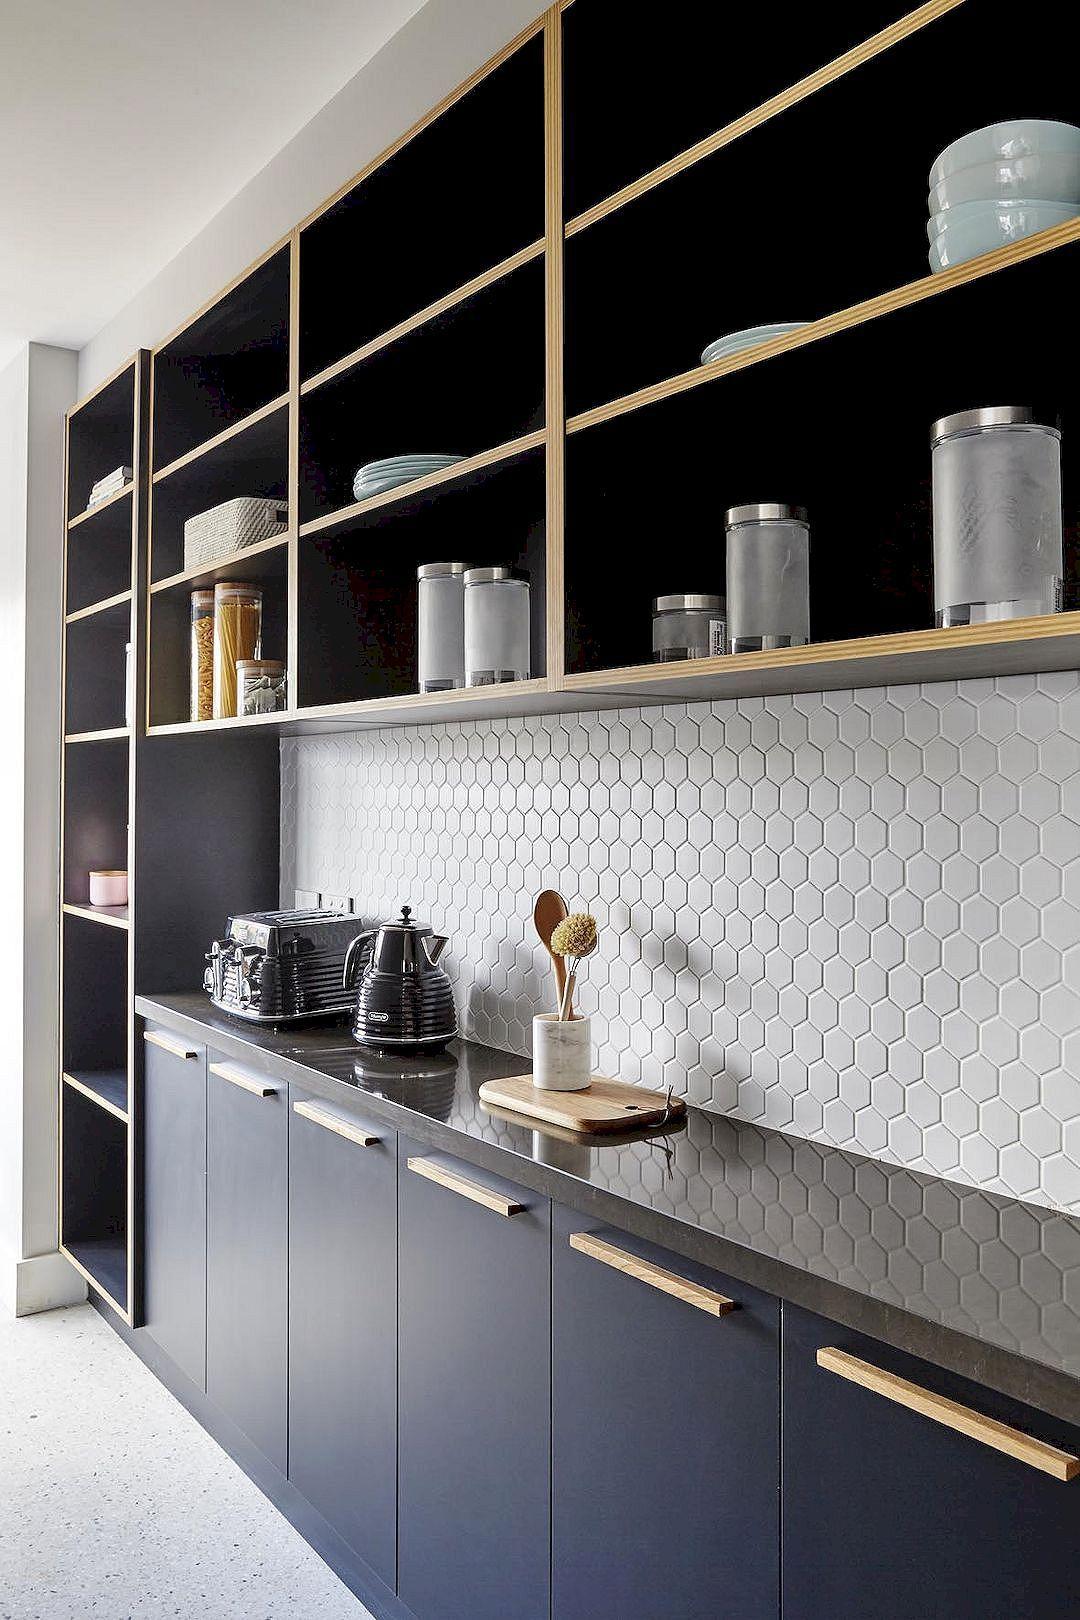 12 nice ideas for your modern kitchen design home k che k chen ideen und moderne k che. Black Bedroom Furniture Sets. Home Design Ideas